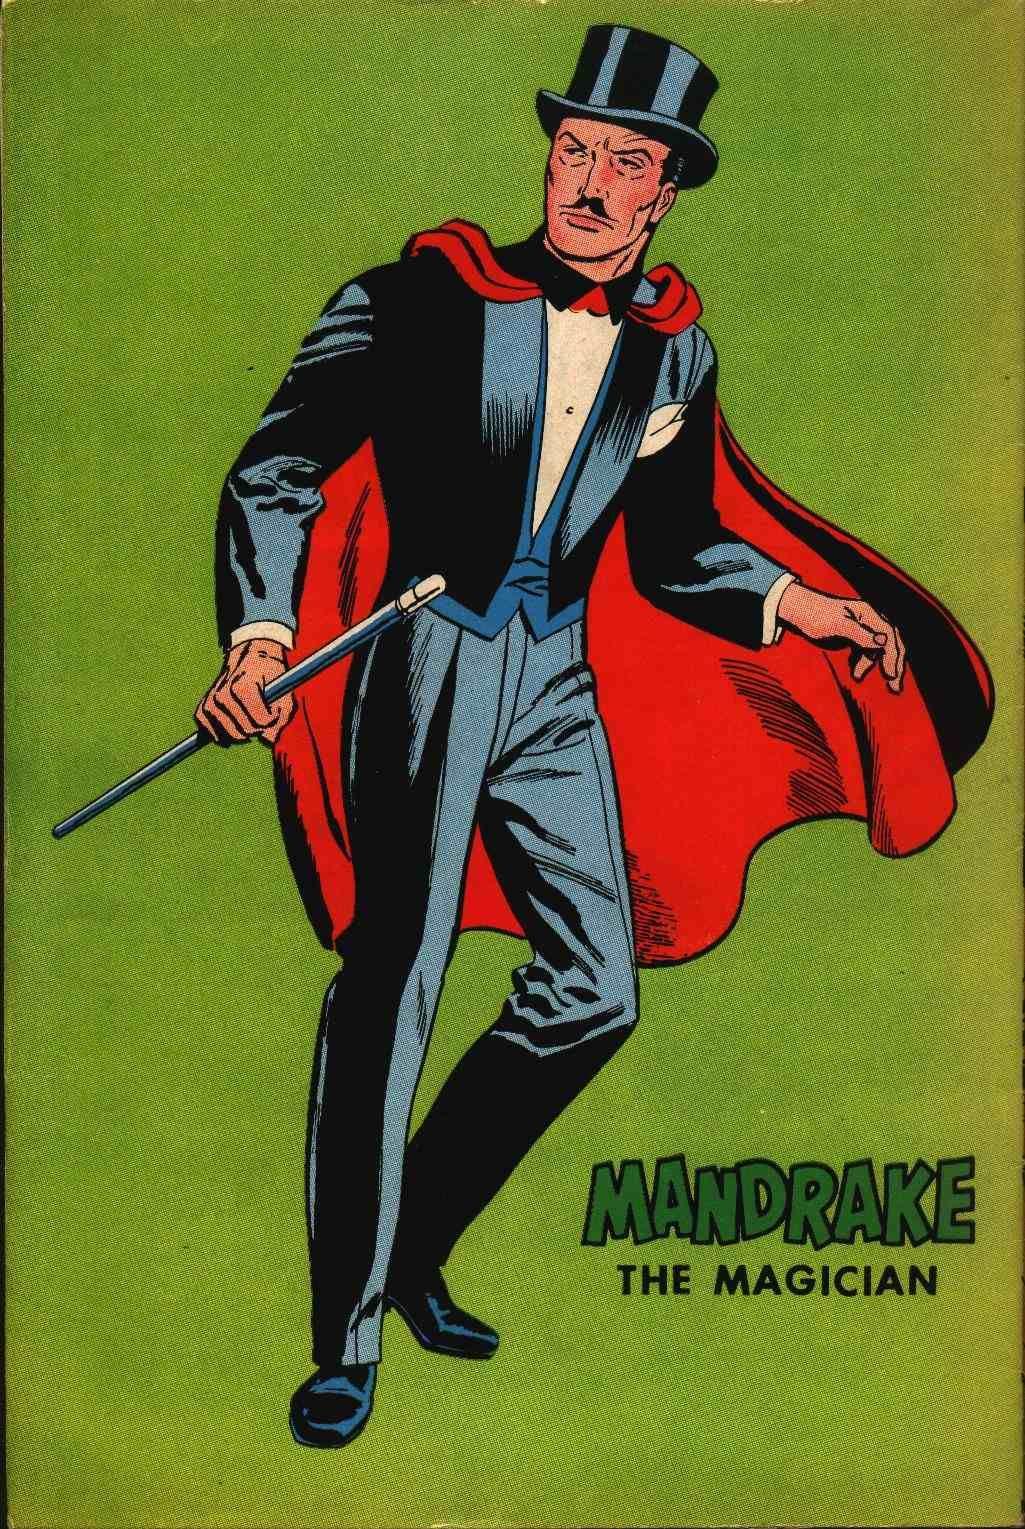 Mandrake the Magician | 00-Mandrake-the-Magician.jpg